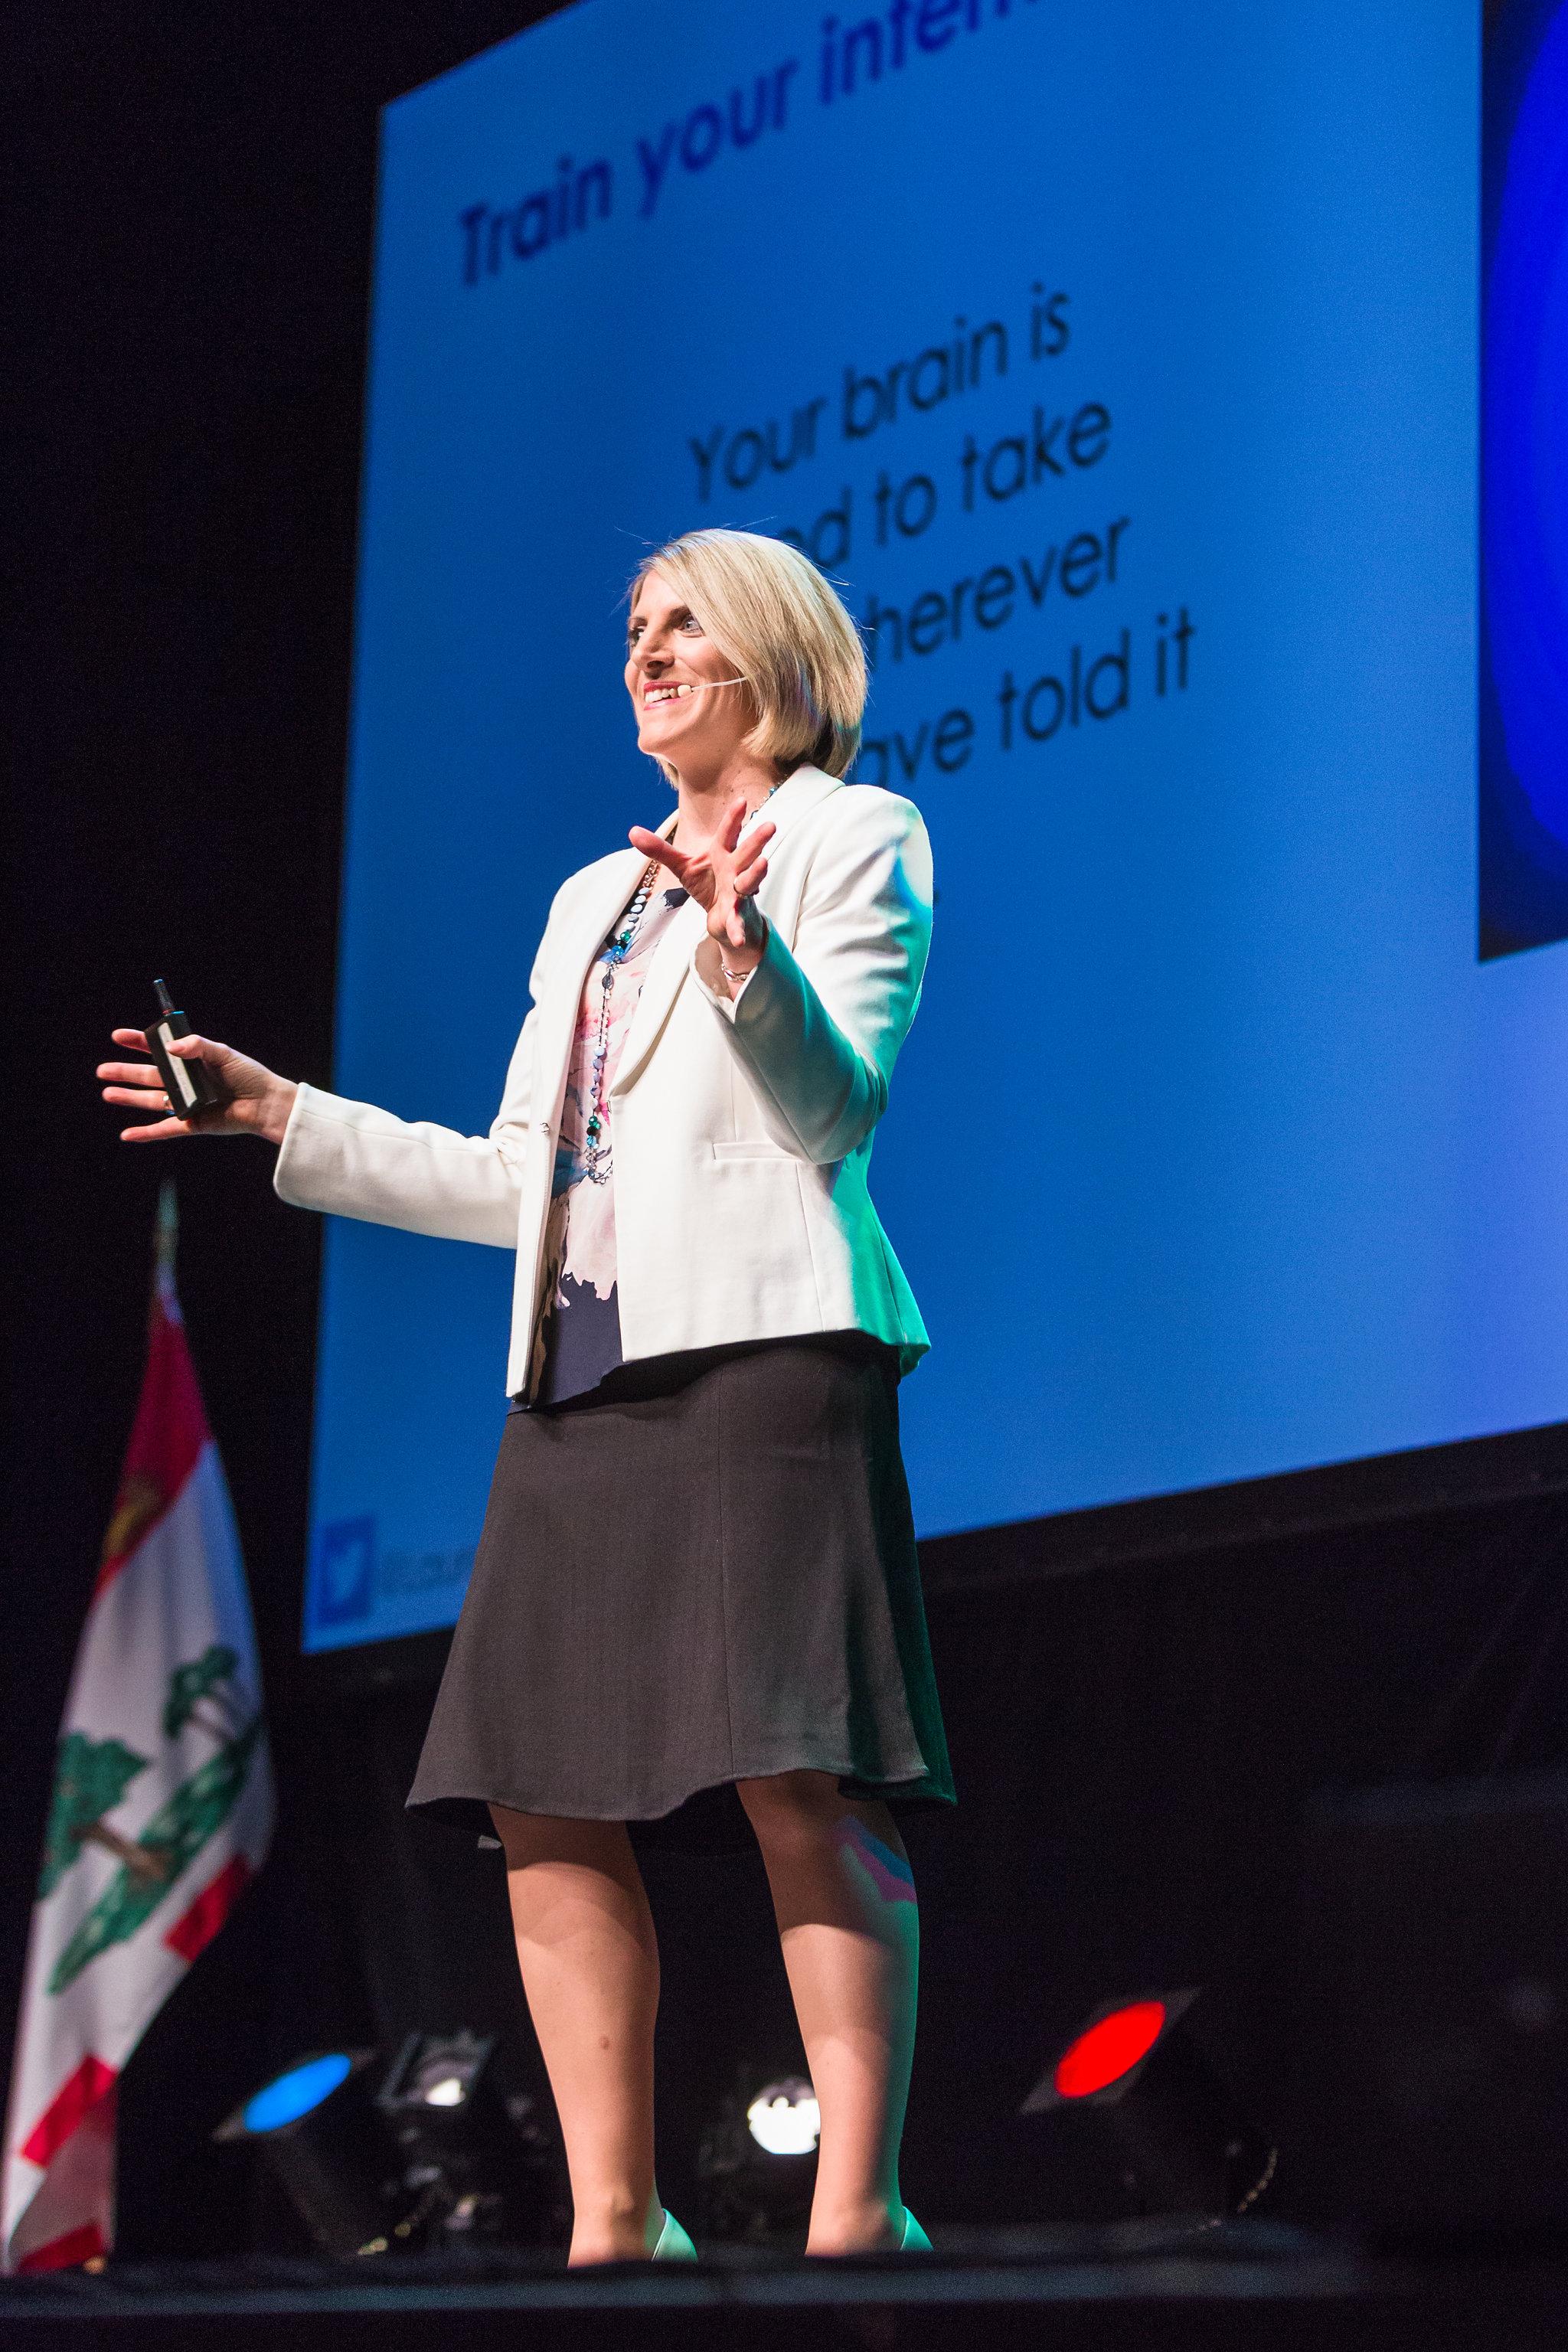 Lauren Parsons Wellbeing Specialist Keynote Speaker